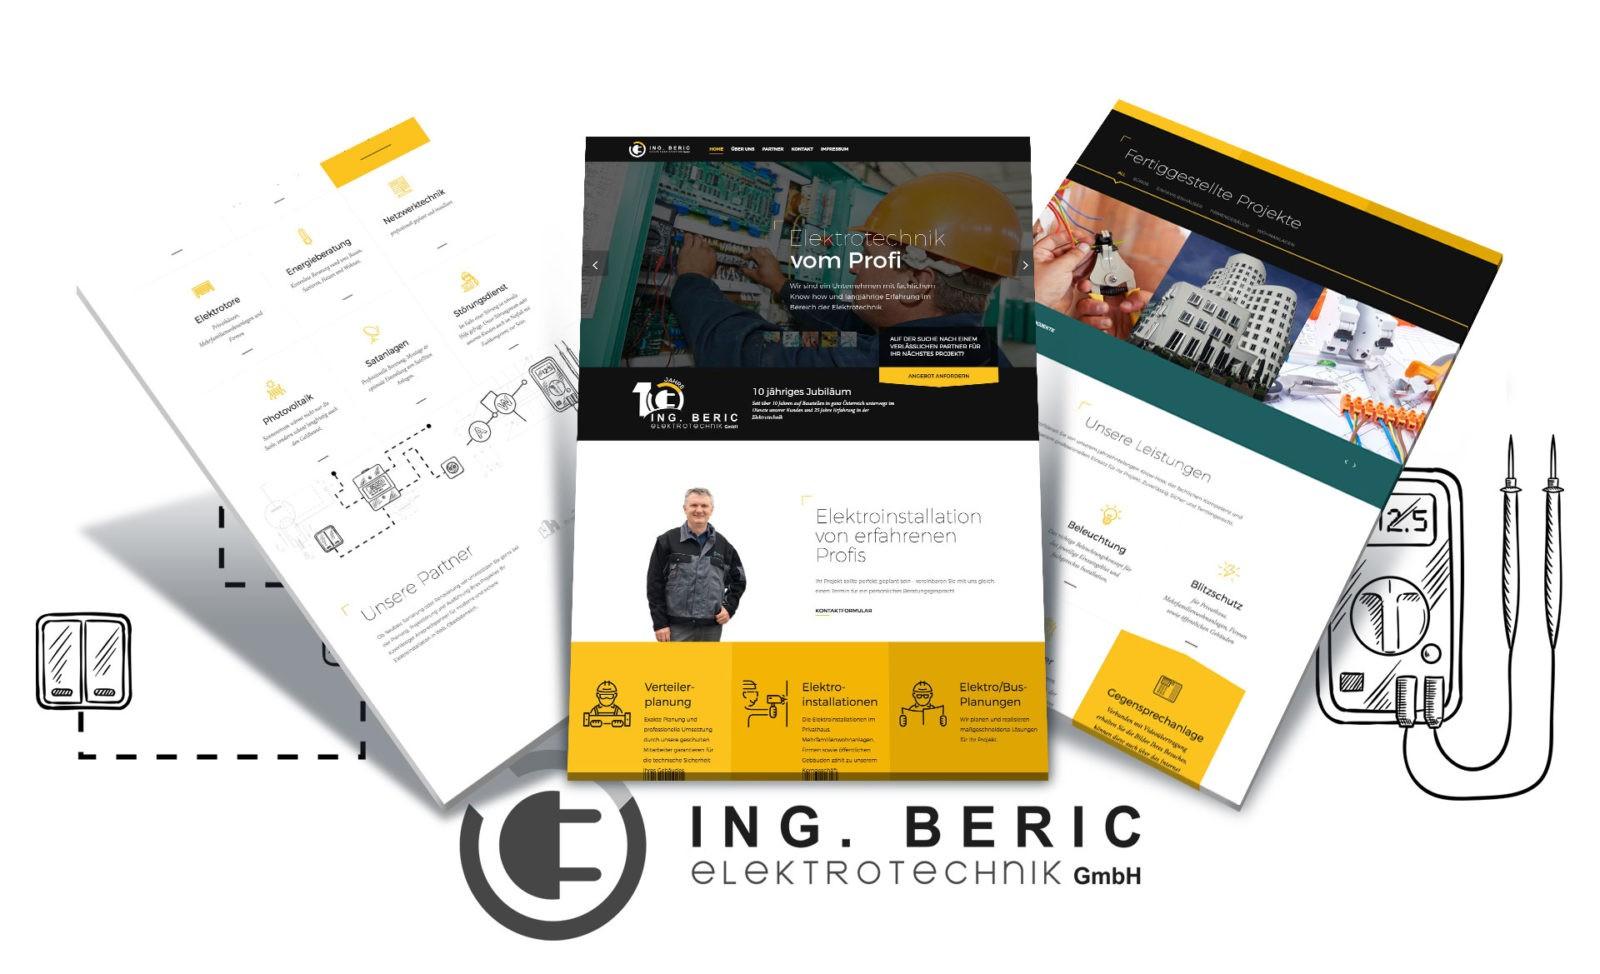 Kunde Ing. Beric Elektrotechnik